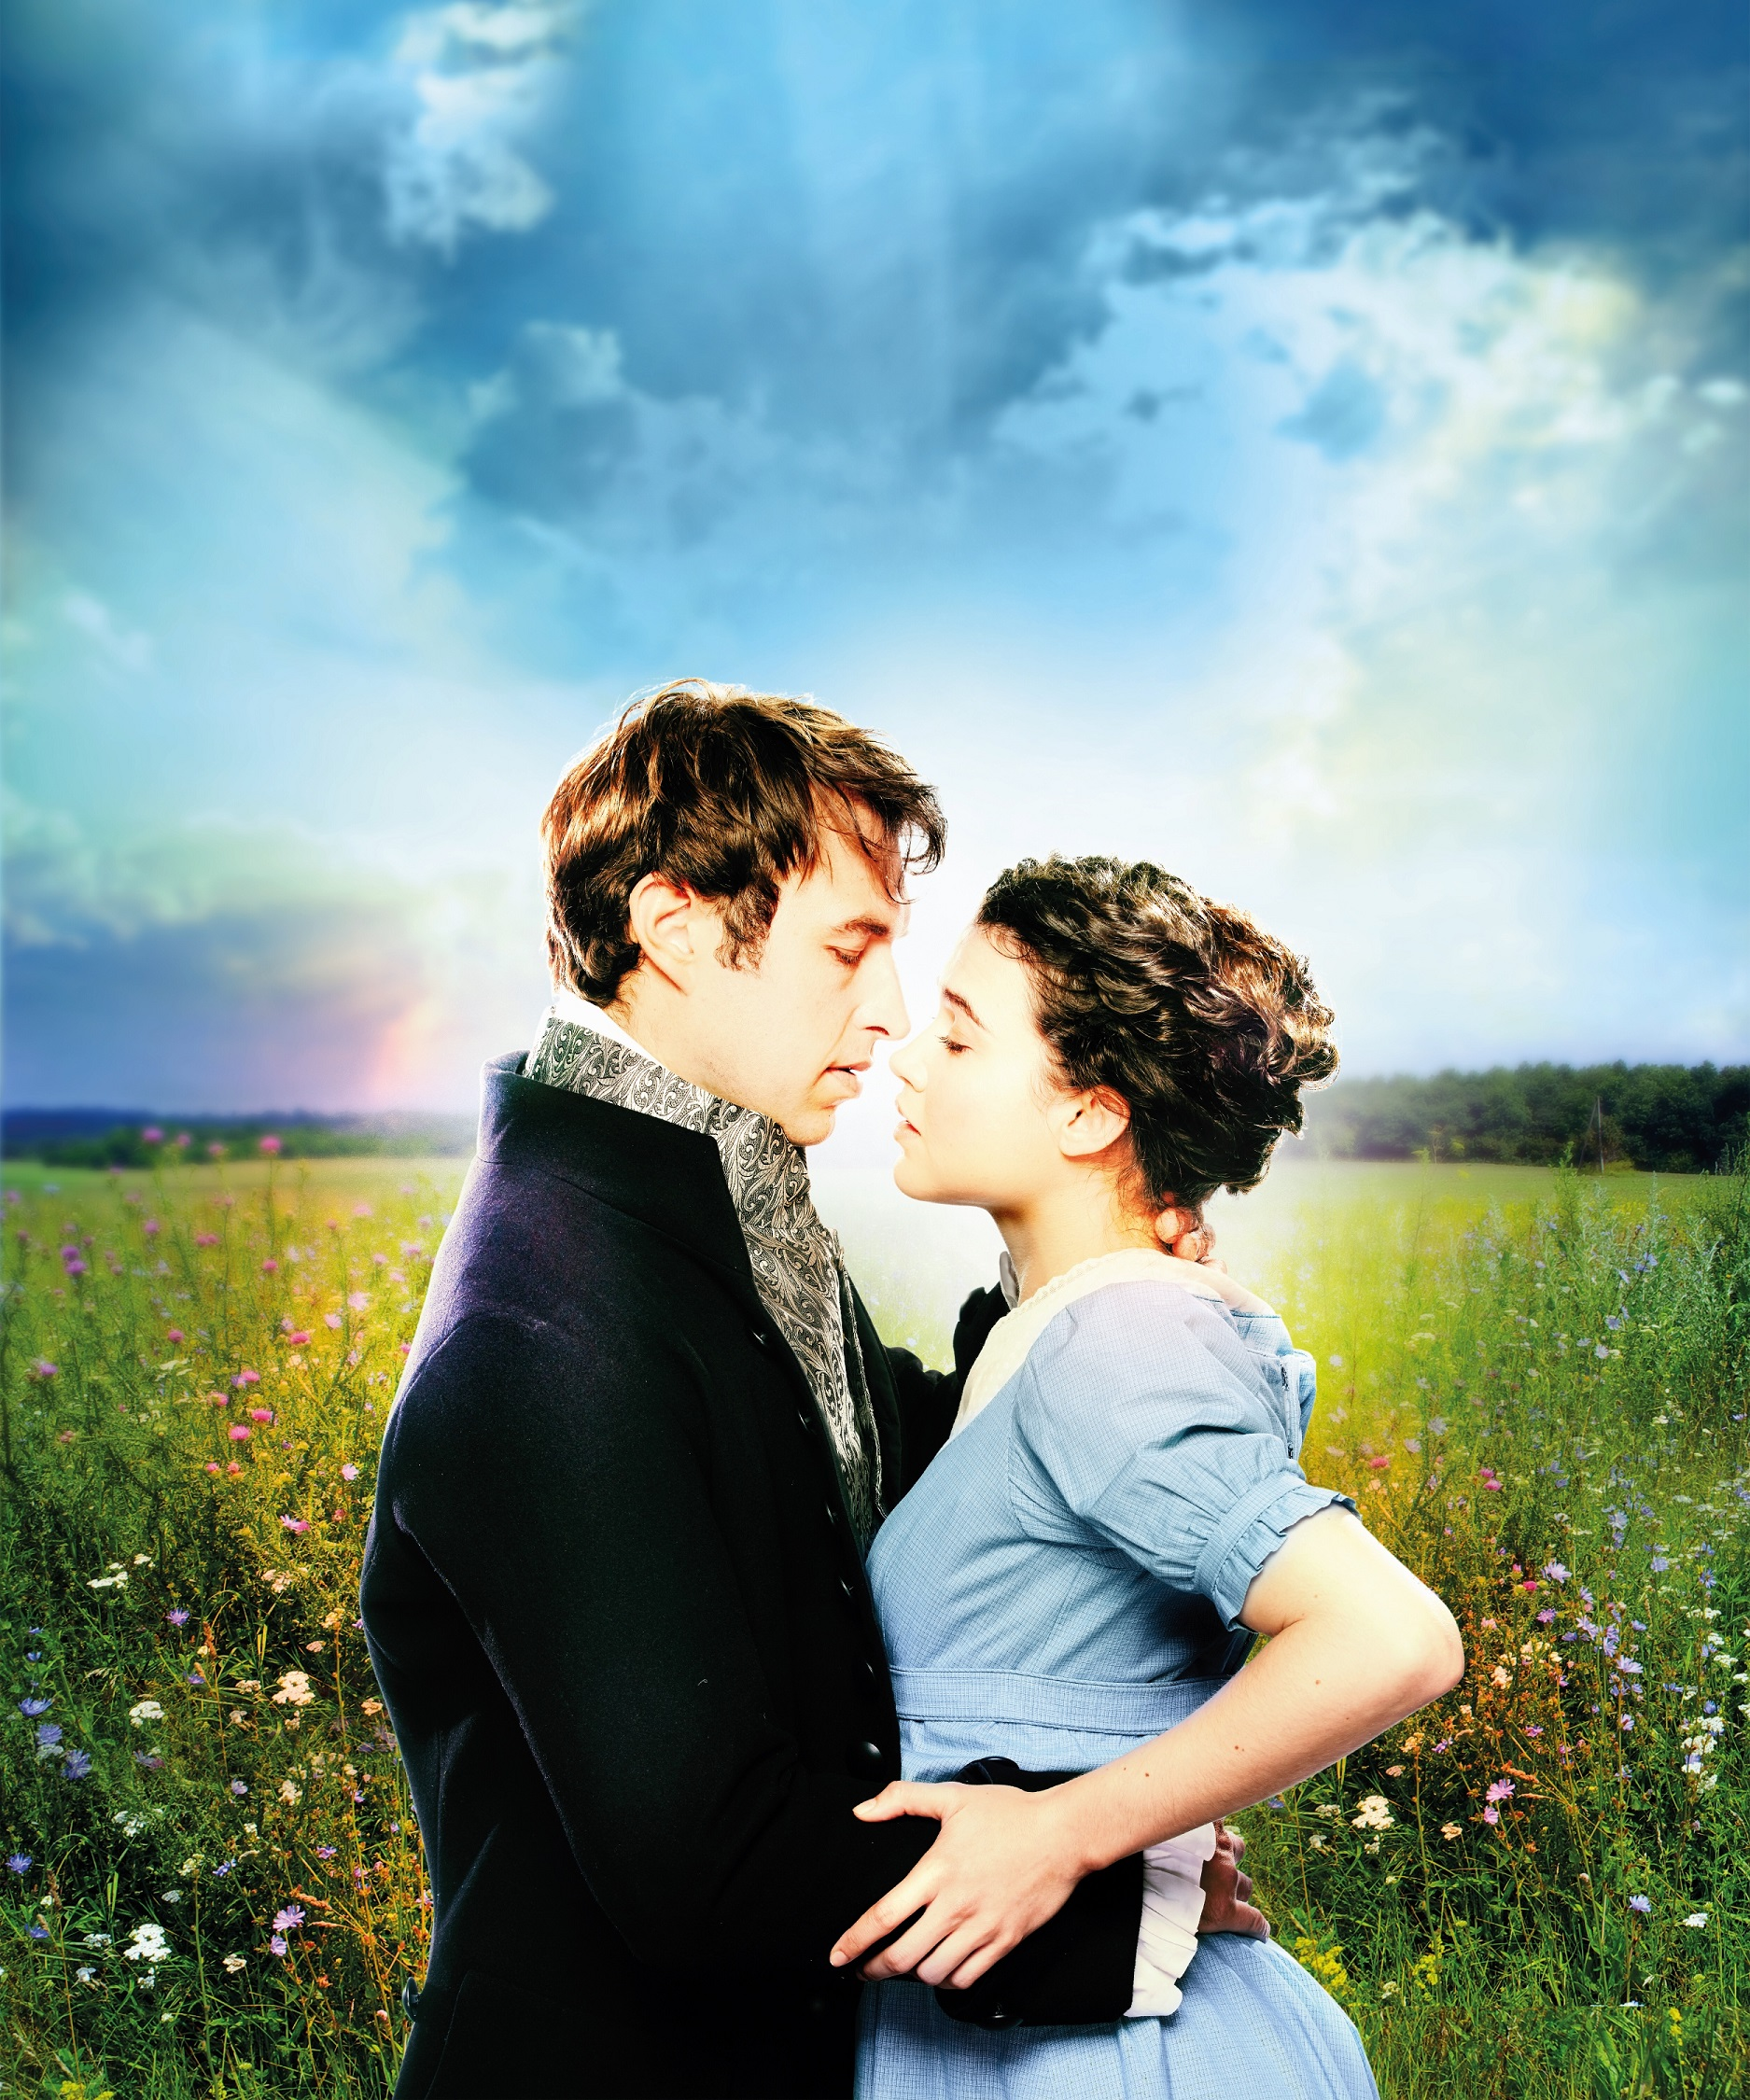 Benjamin Dilloway as Mr Darcy and Tafline Steen as Elizabeth Bennet in Pride and Prejudice. Photo Simon Turtle. Artwork Feast Creative